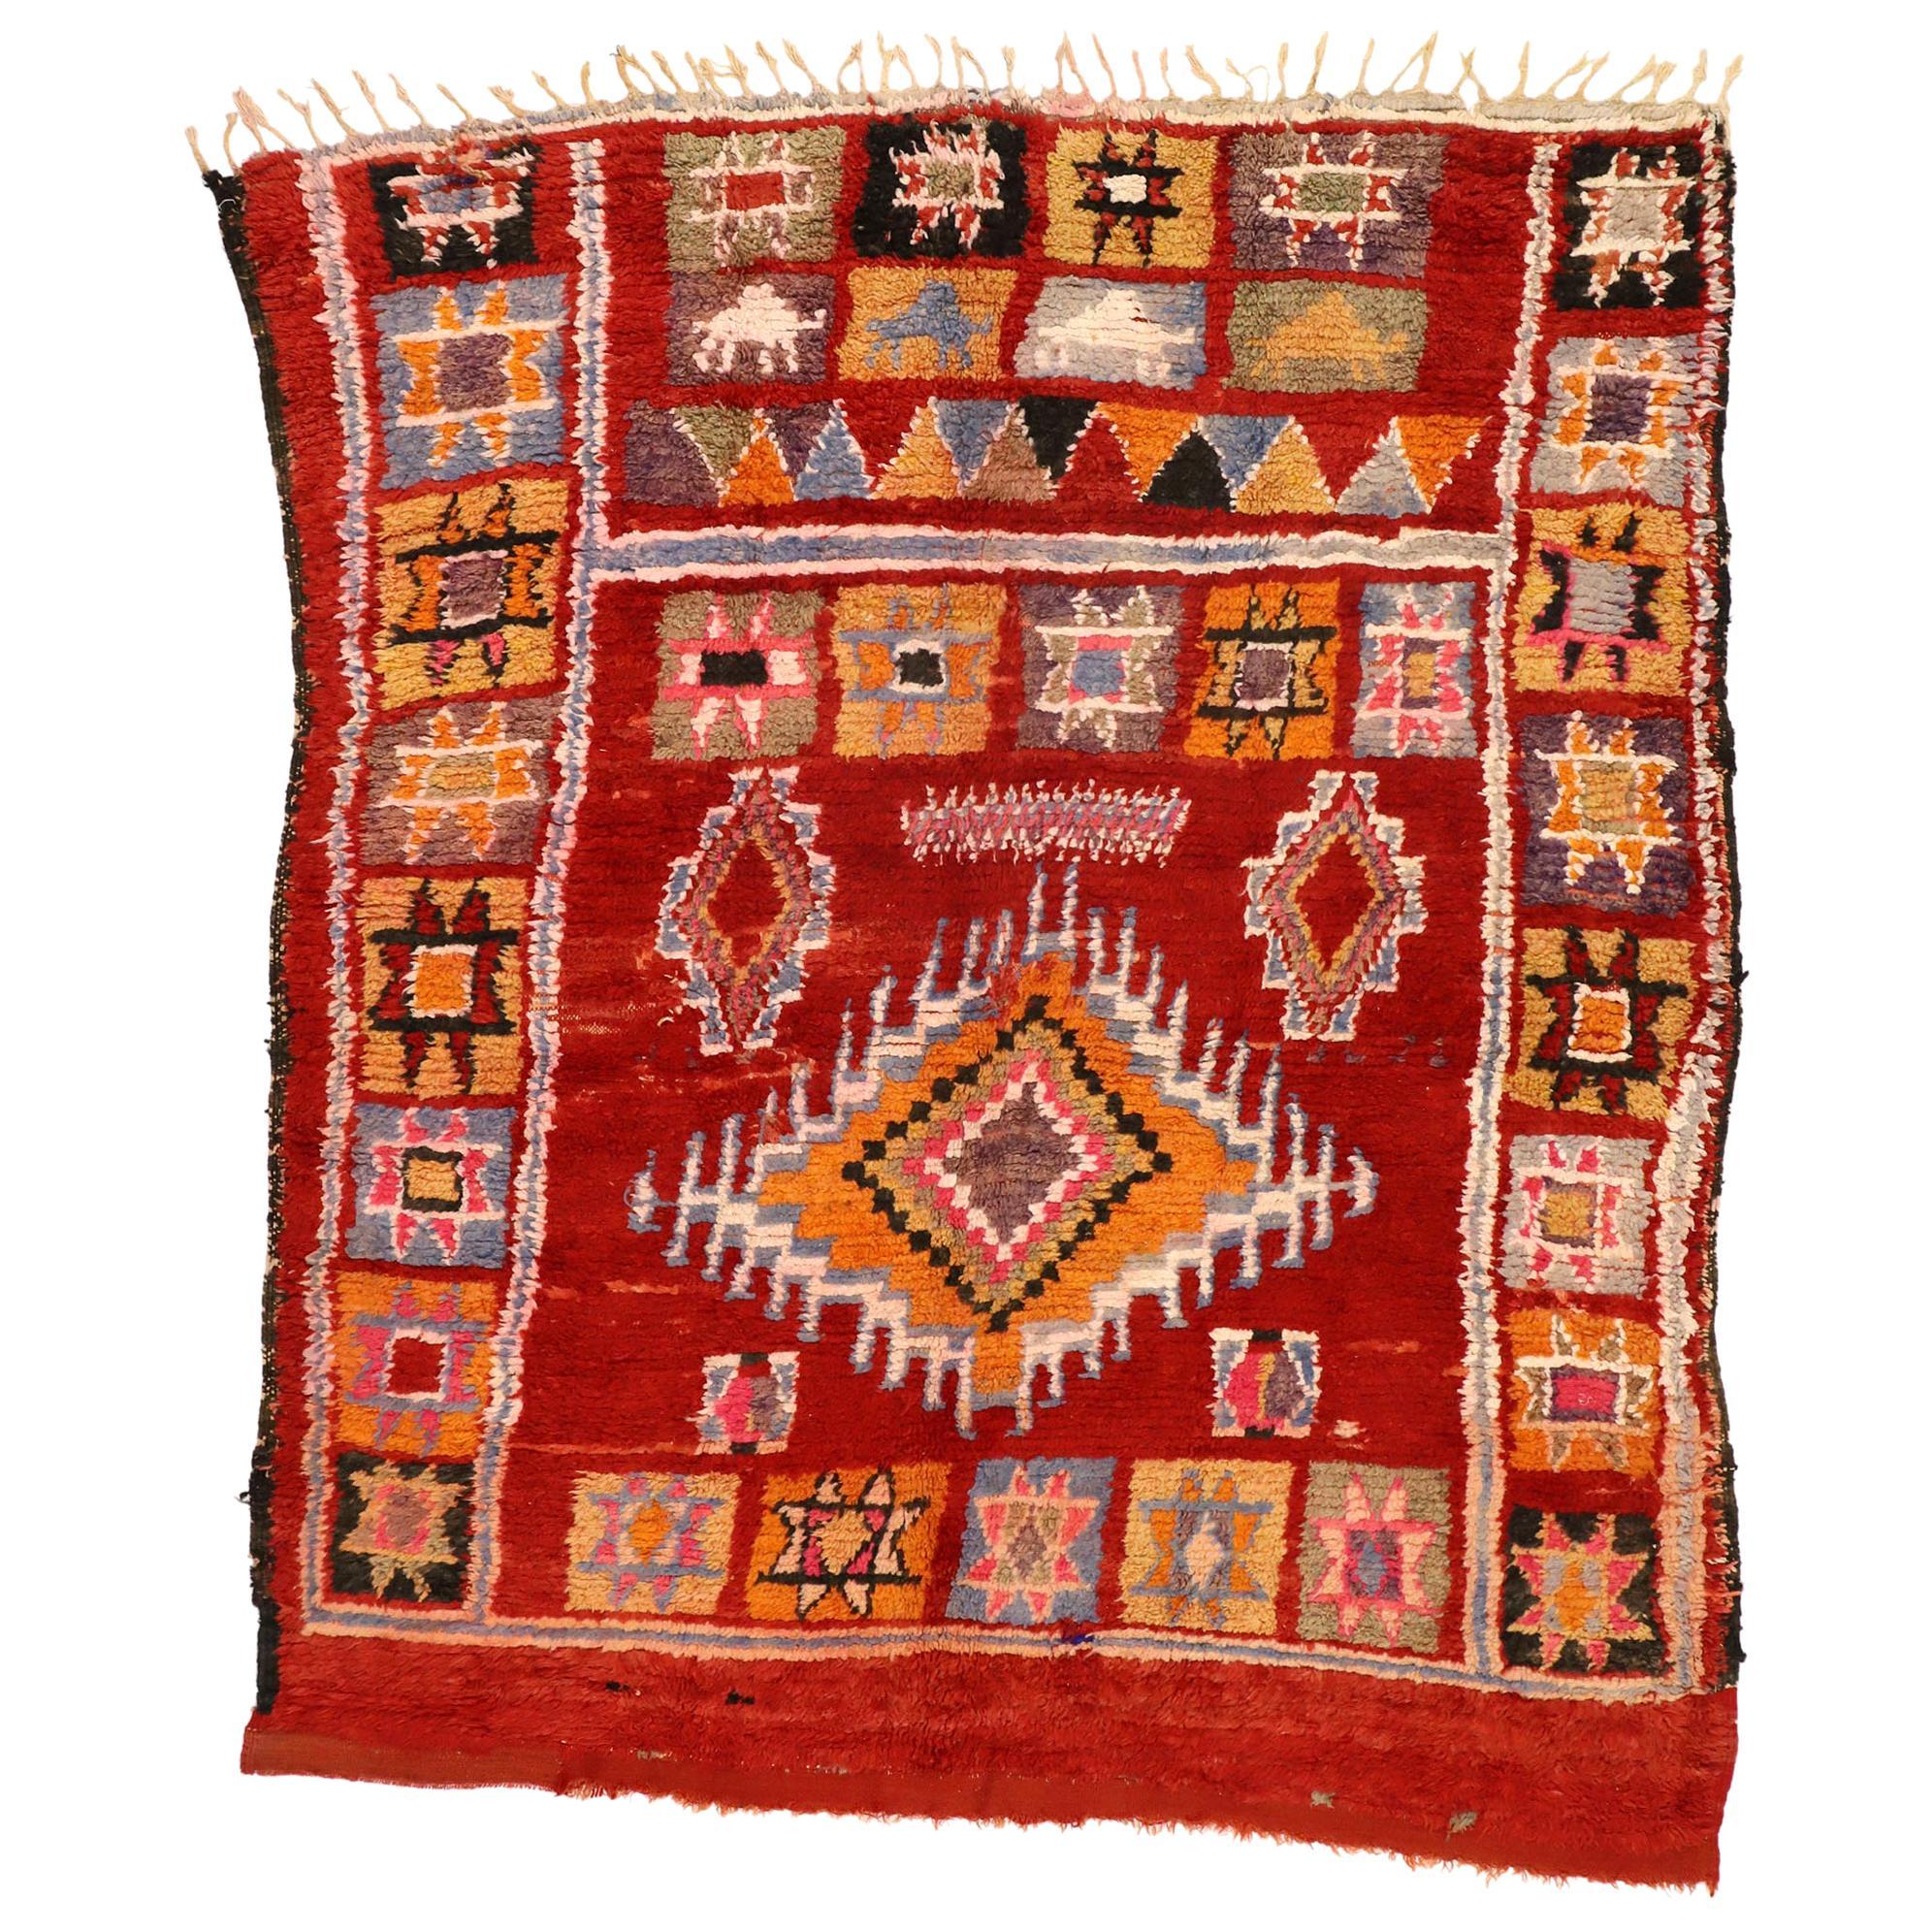 Vintage Berber Moroccan Rug with Boho Chic Tribal Artisan Style